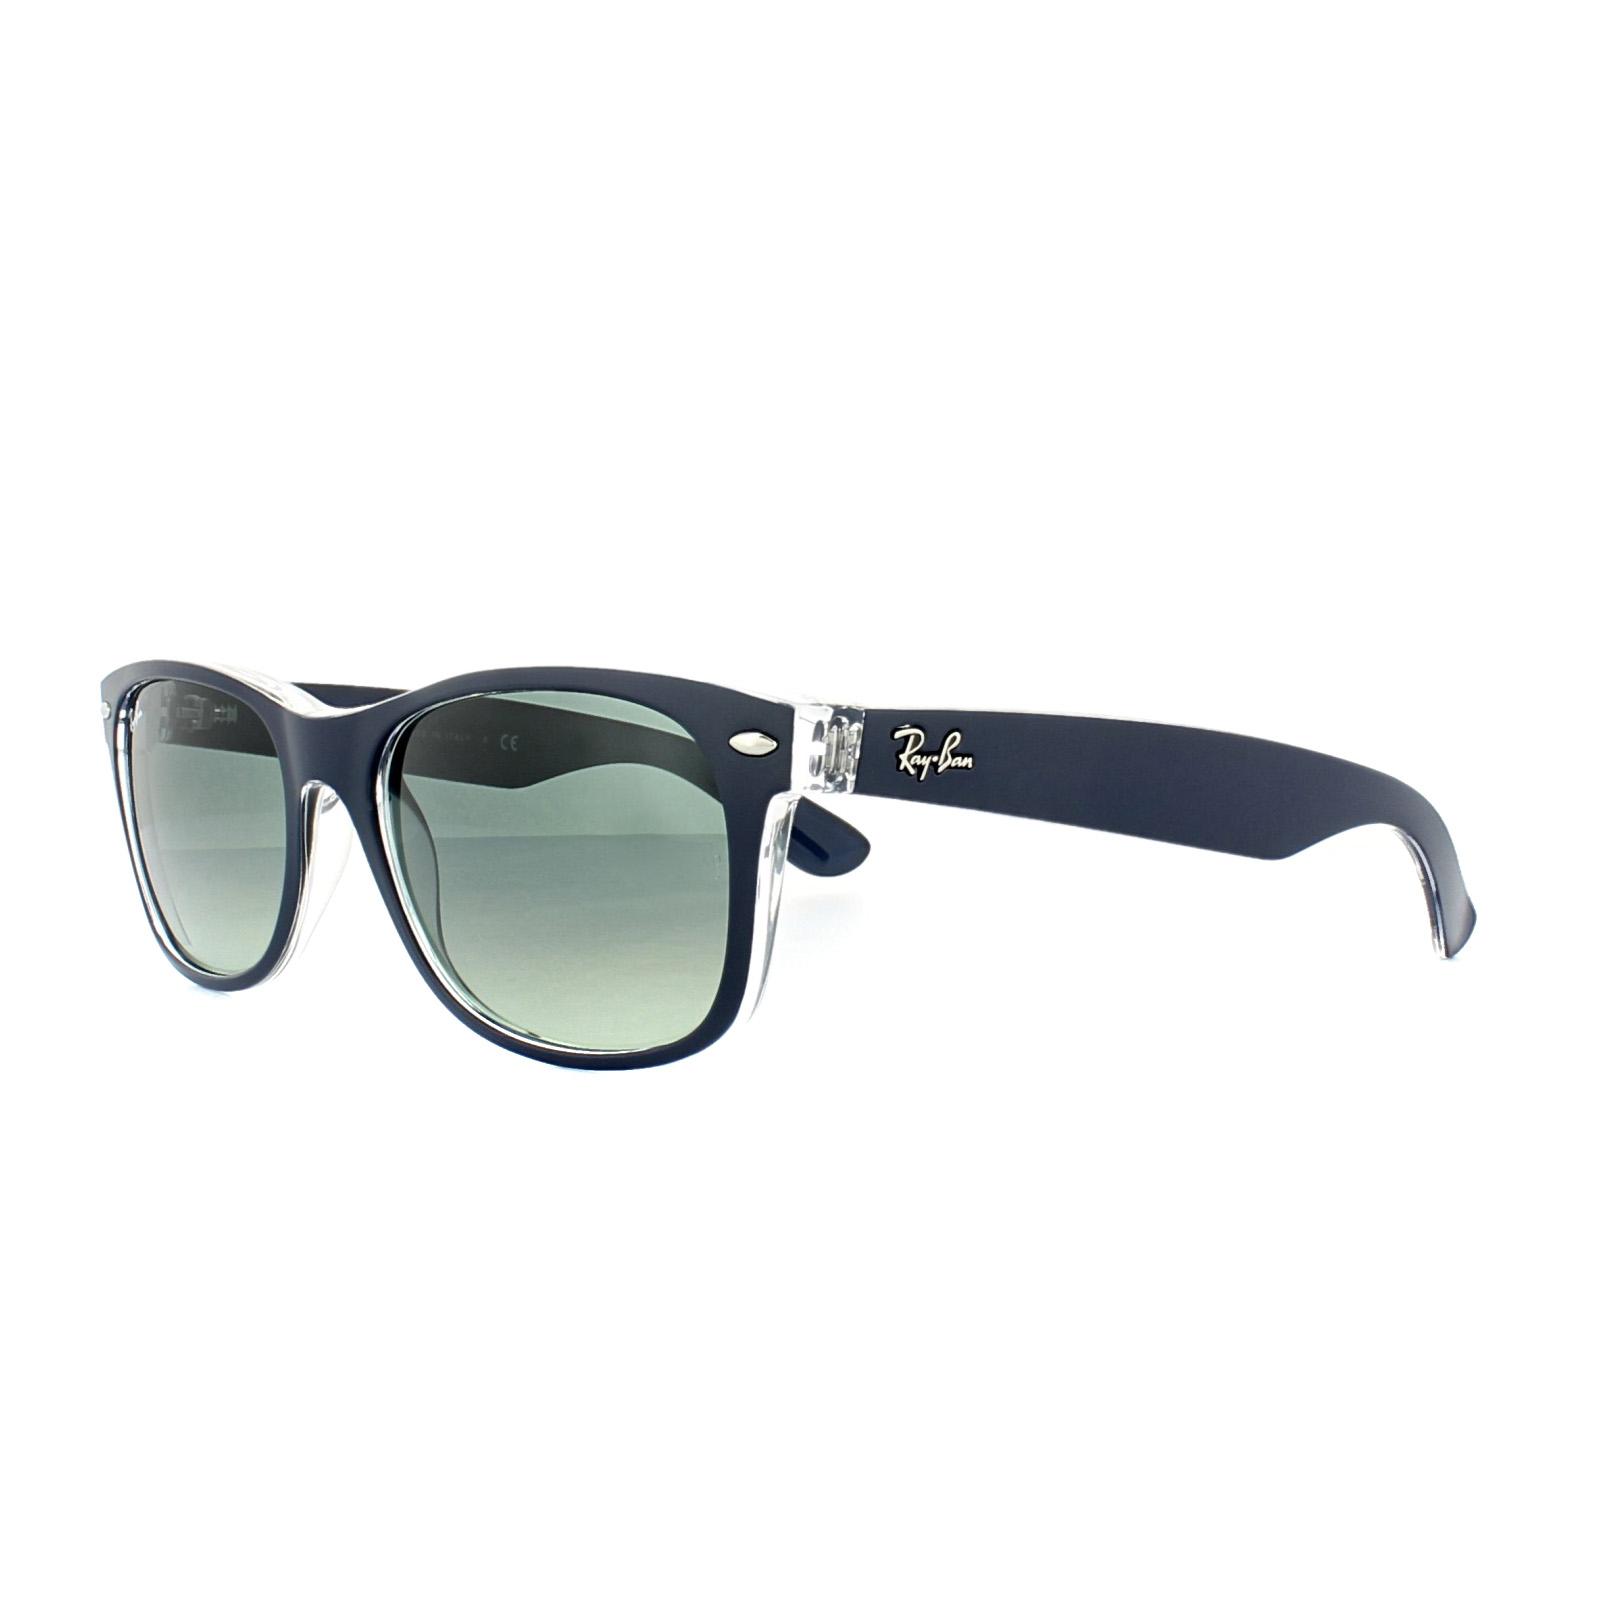 eb63e33926 Sentinel Ray-Ban Sunglasses New Wayfarer 2132 605371 Blue Transparent Grey  Gradient Med